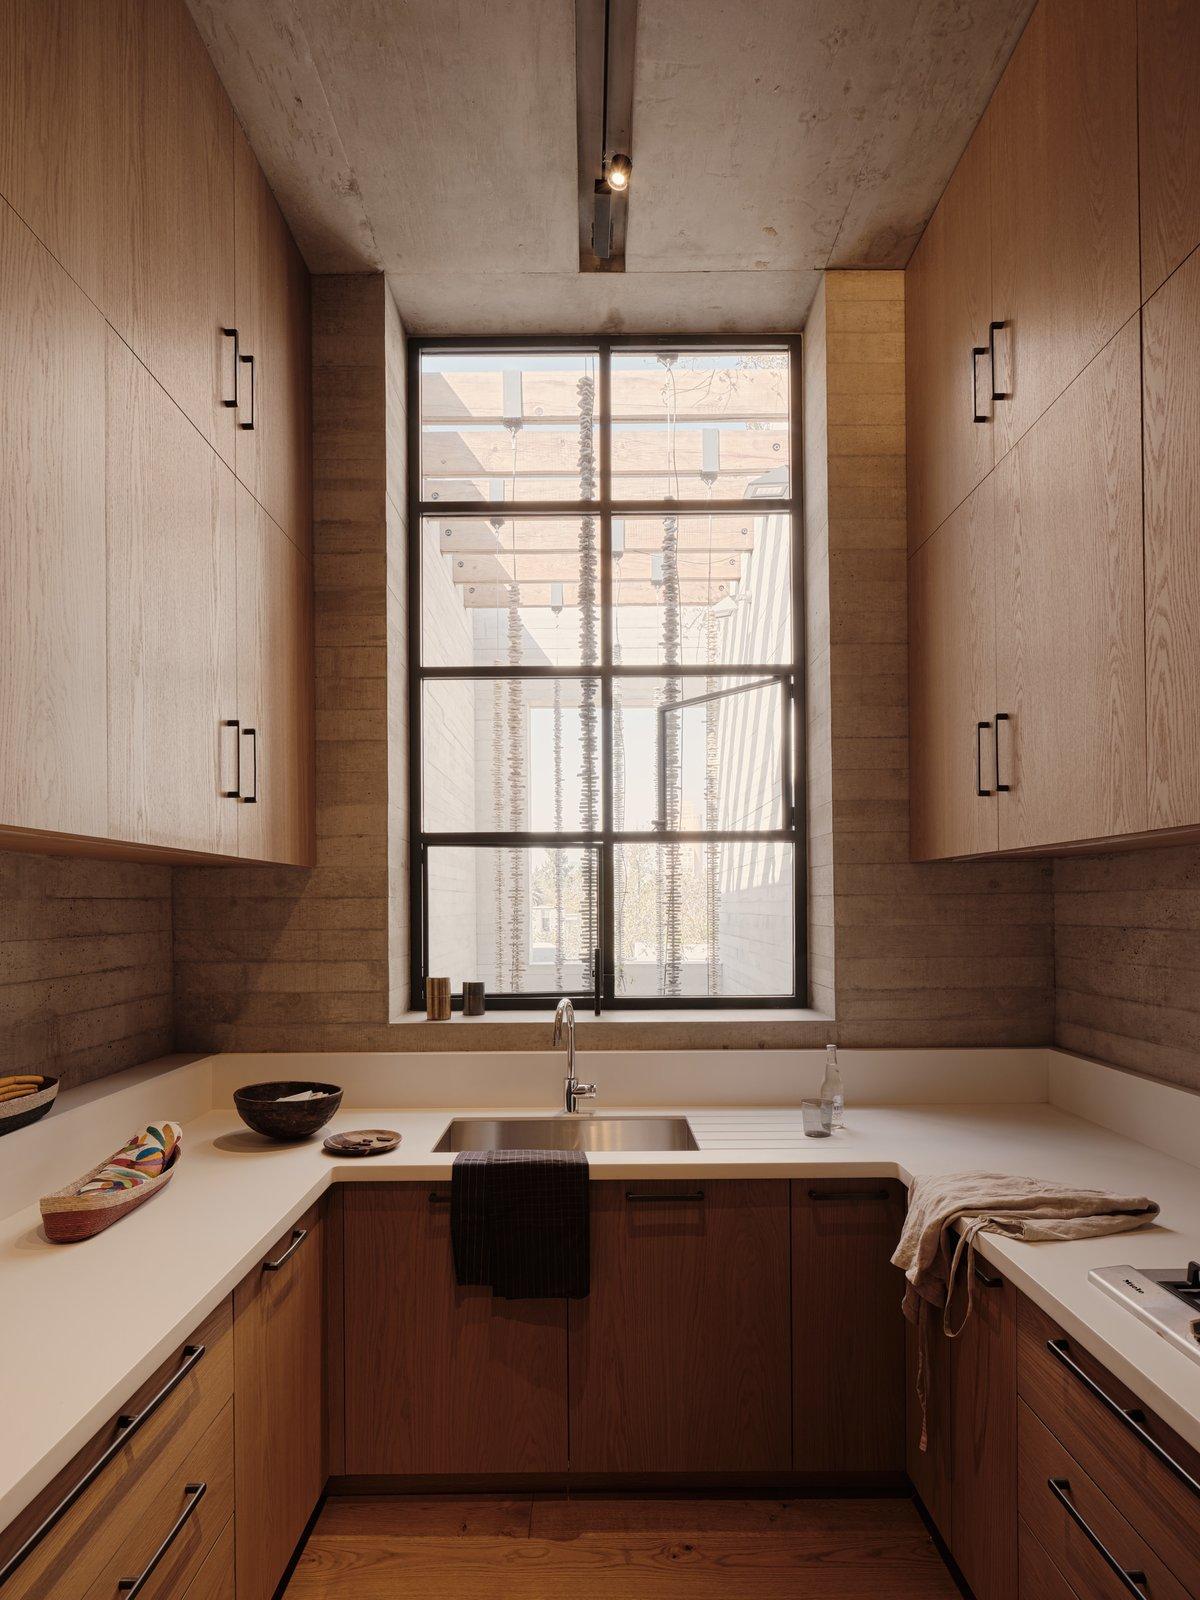 Tennyson 205 Rick Joy Palanco Apartment Kitchen